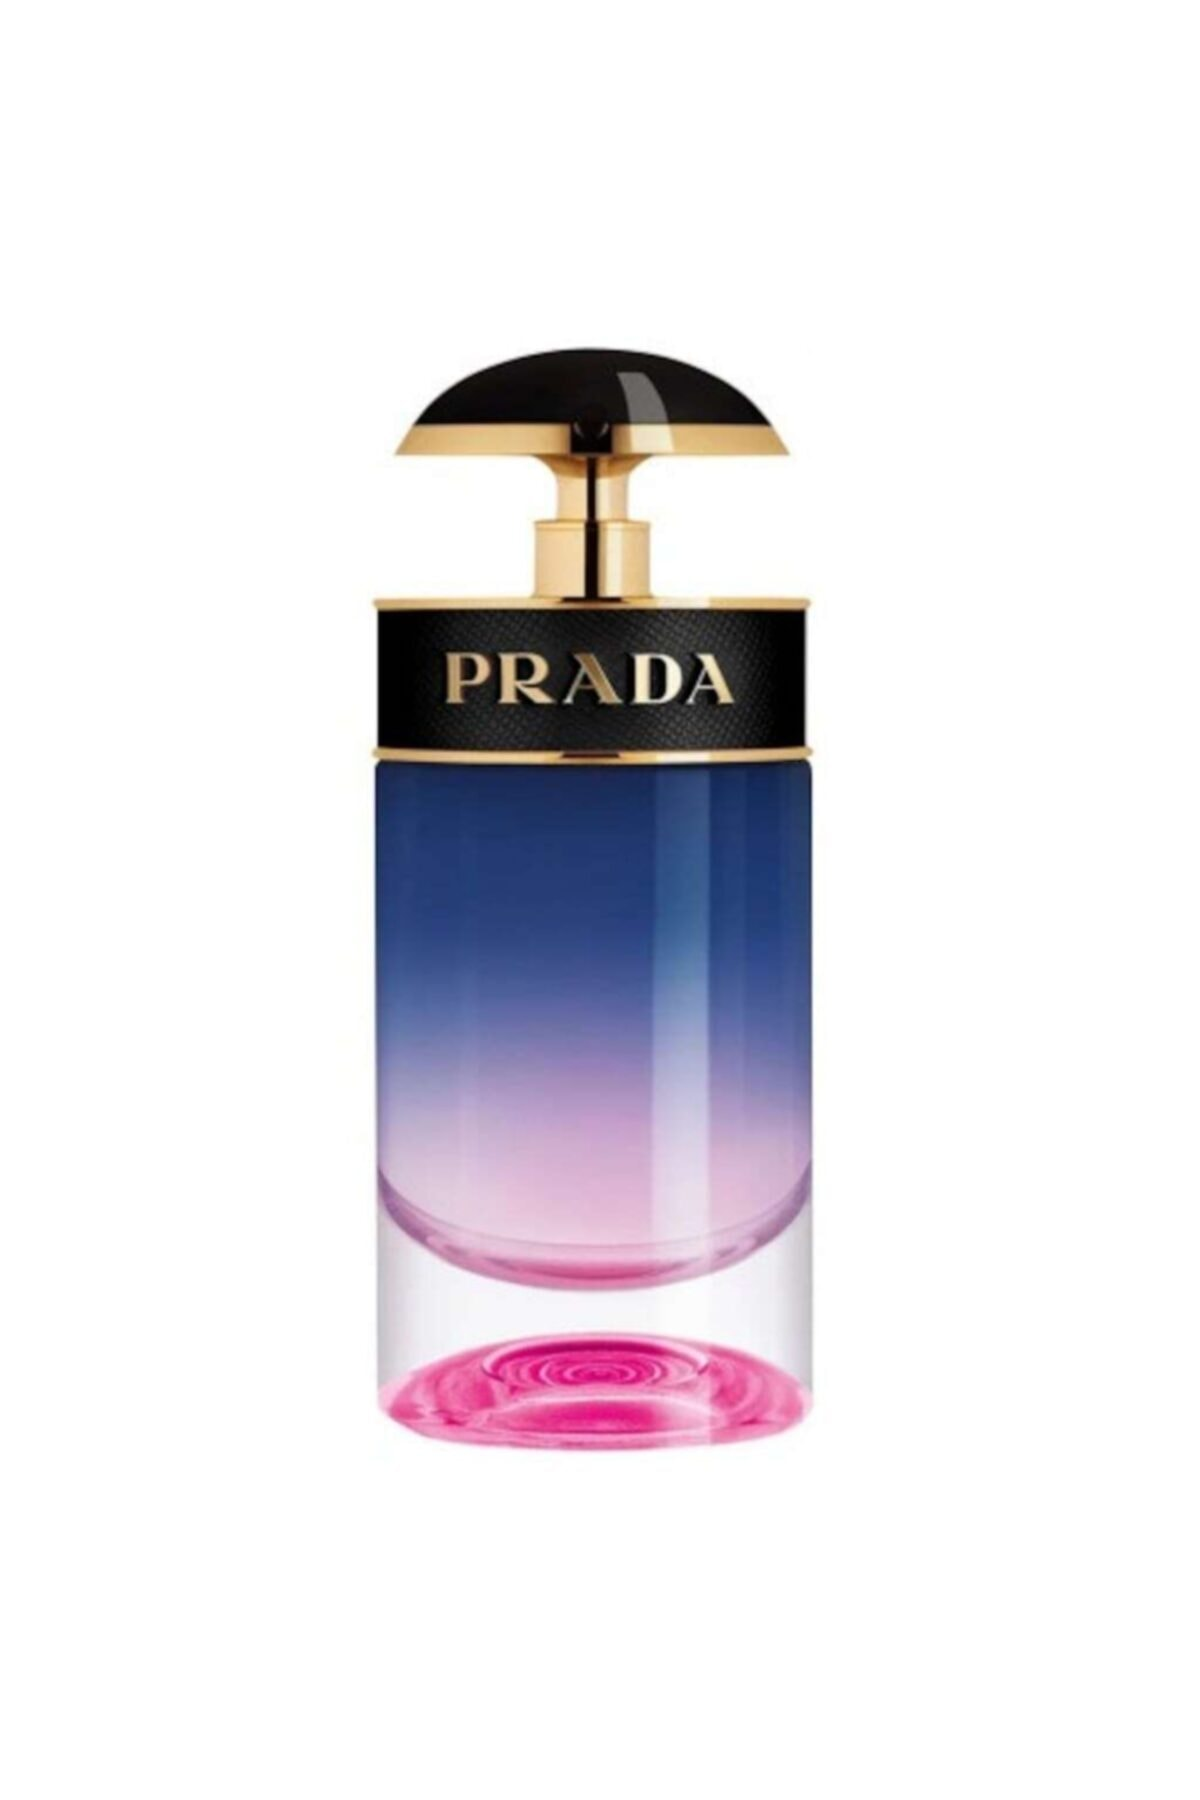 Prada Candy Night Edp 50 ml Kadın Parfüm 8435137793617 1